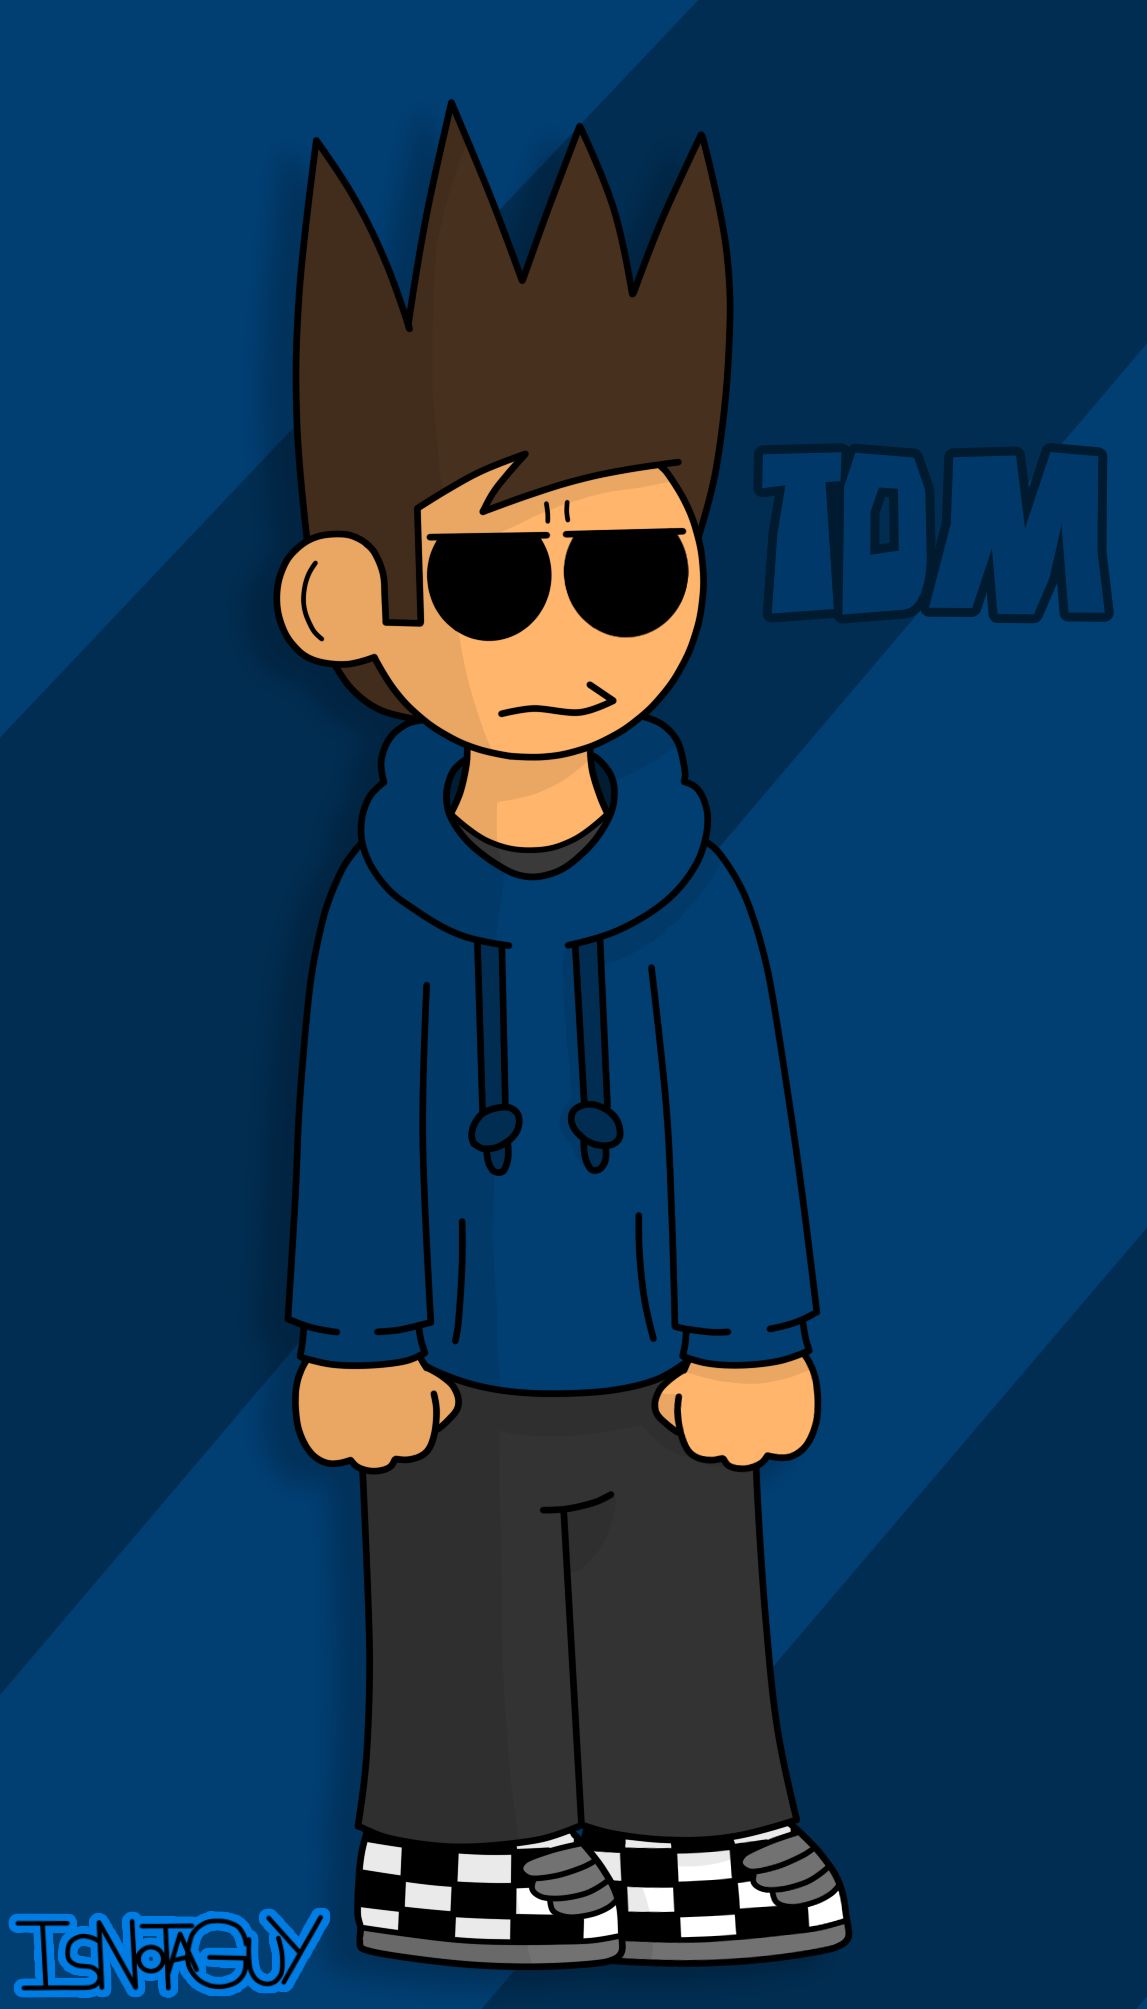 Its Tom... Again!